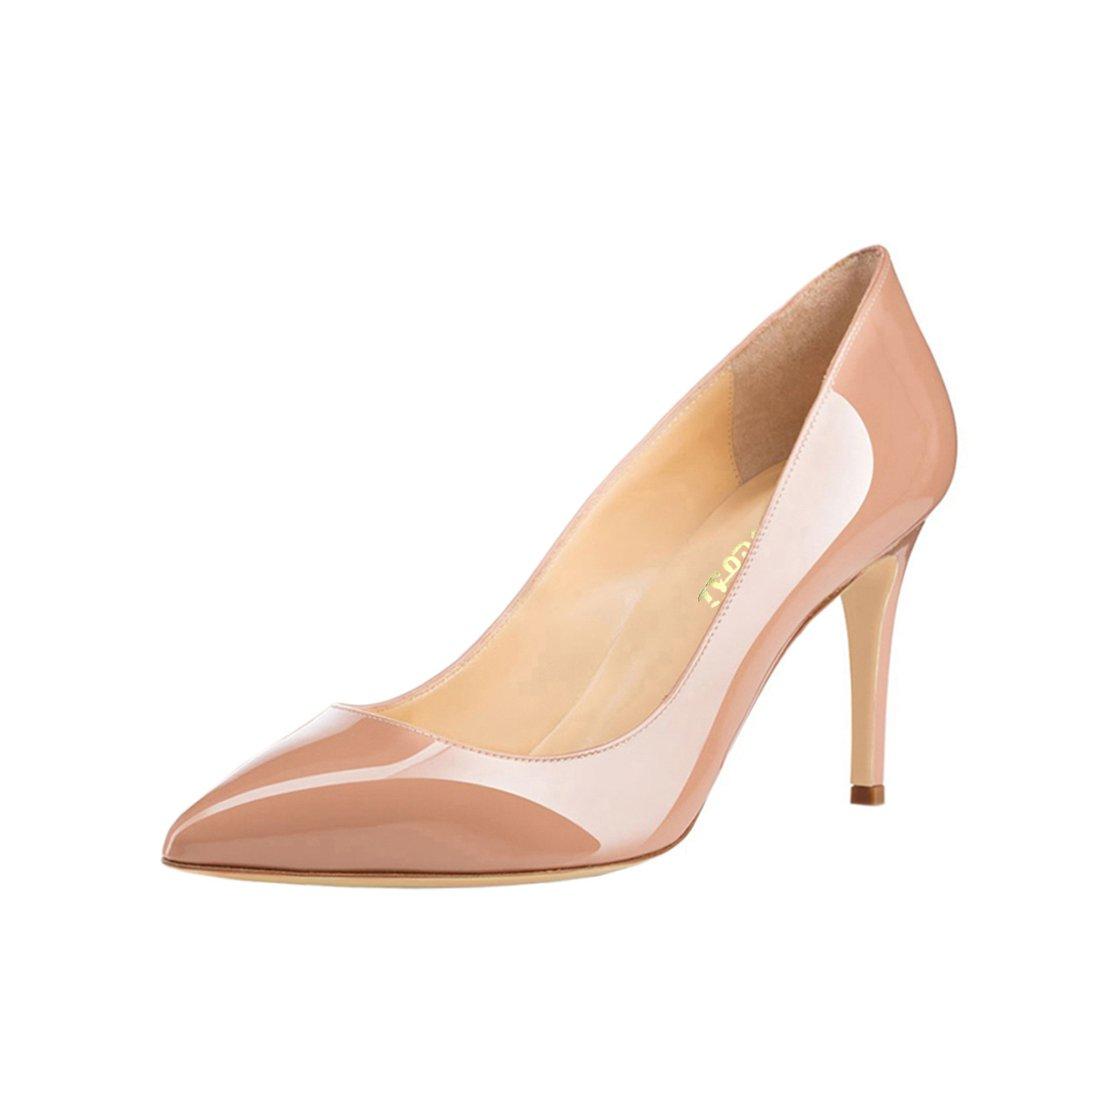 VOCOSI Women's Basic Simple High Heels Slip On Closed Pointed Toe Ladies Dress Pumps B078W6XTQ7 12 B(M) US|Nude-patent